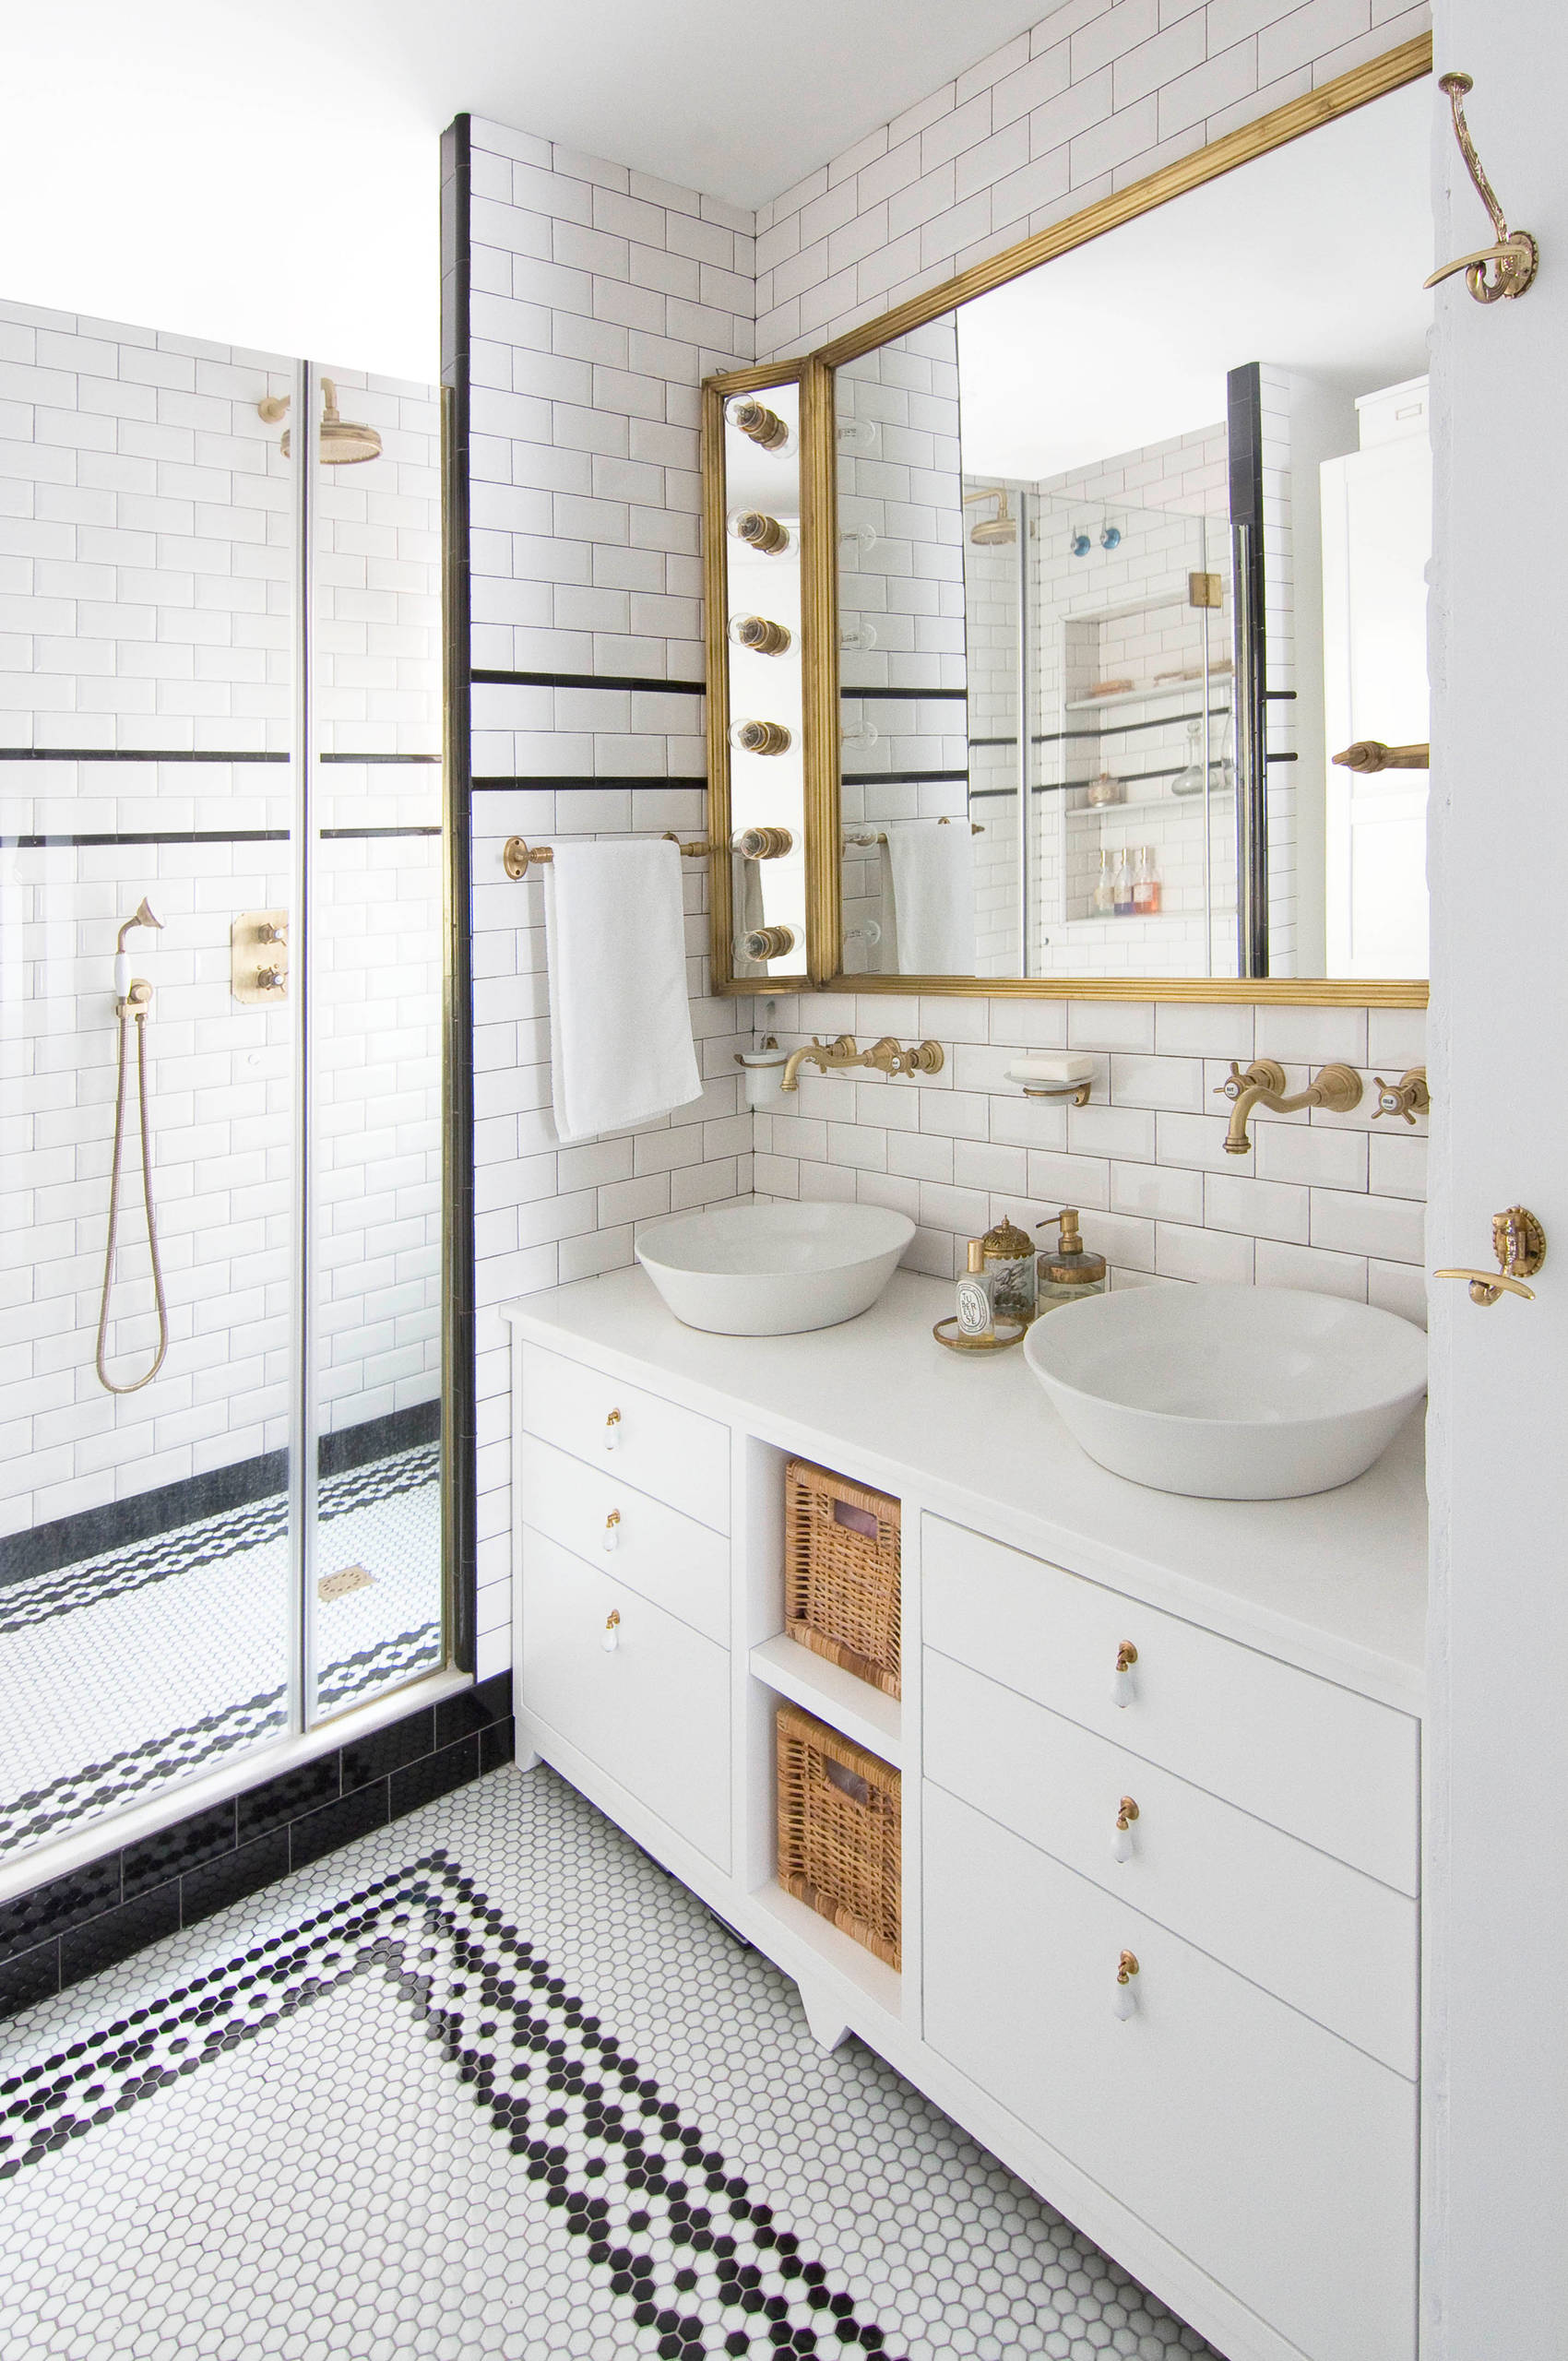 Black And White Tile Floor Bathroom, Black And White Bathroom Floor Tile Ideas